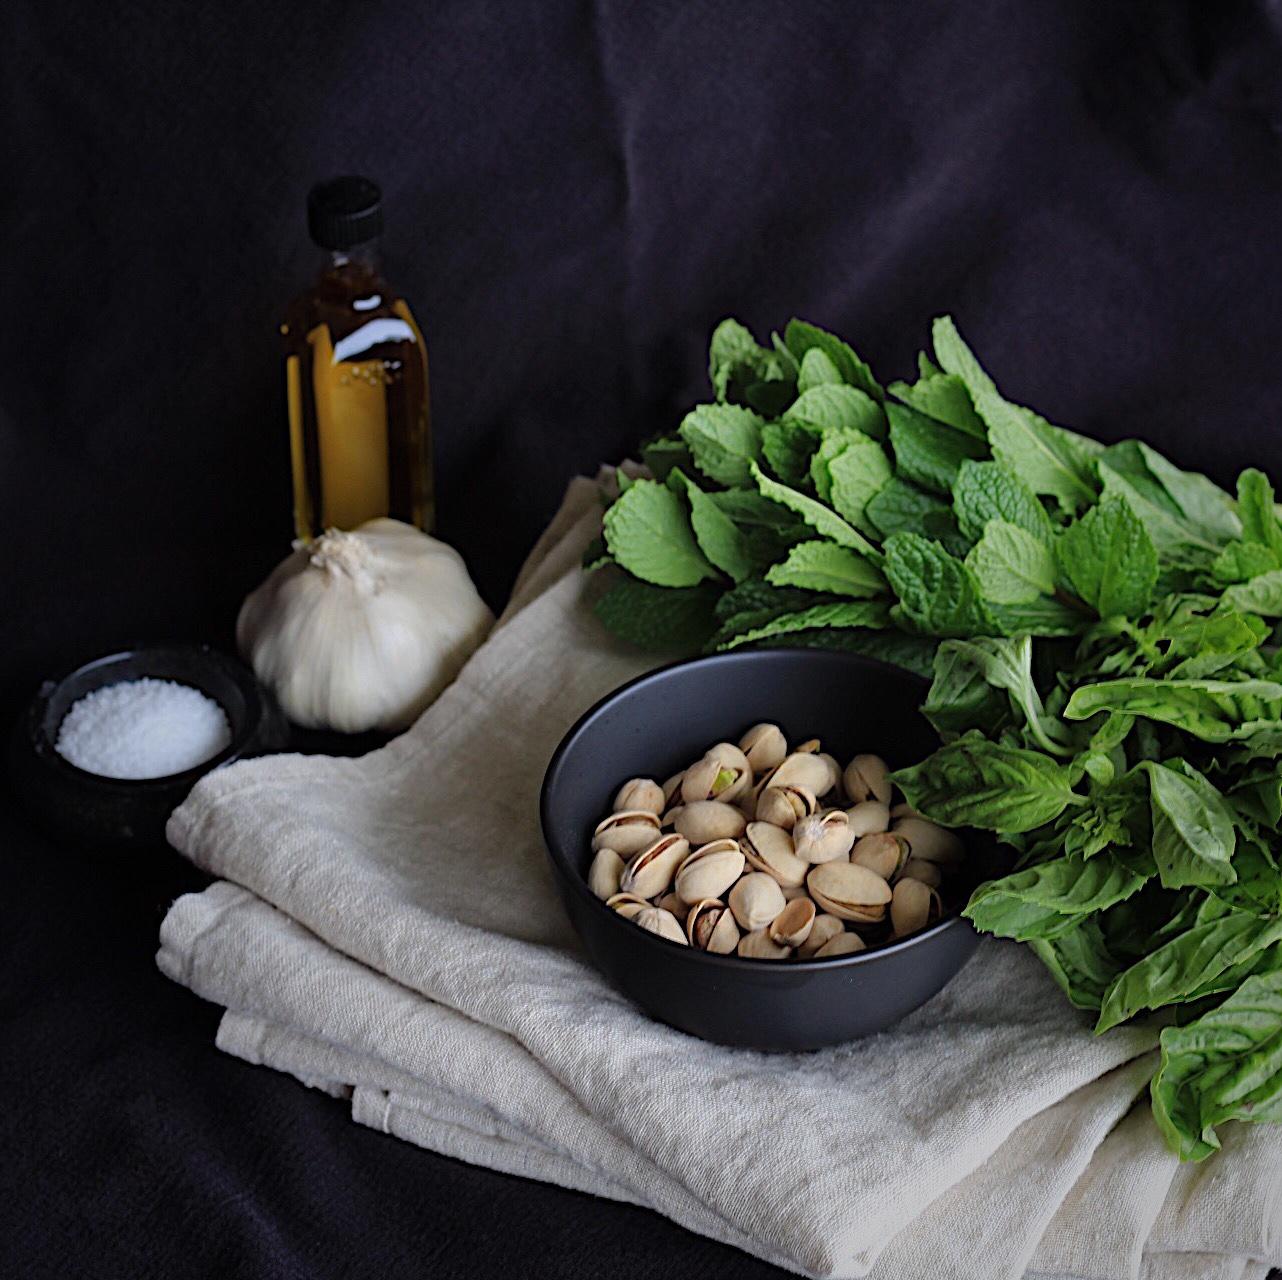 Mint Basil Pistachio Pesto Ingredients